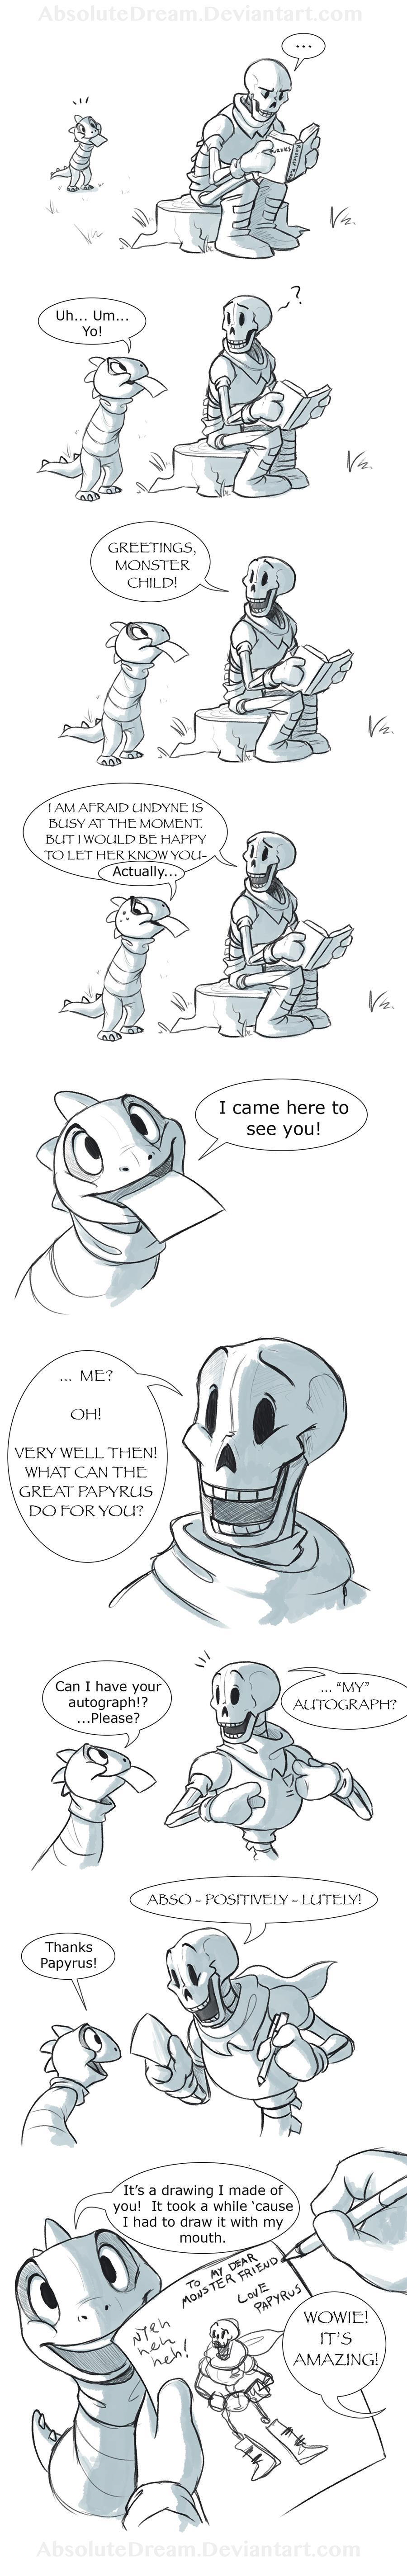 Papyrus's New Fan:  Part 1 of 3